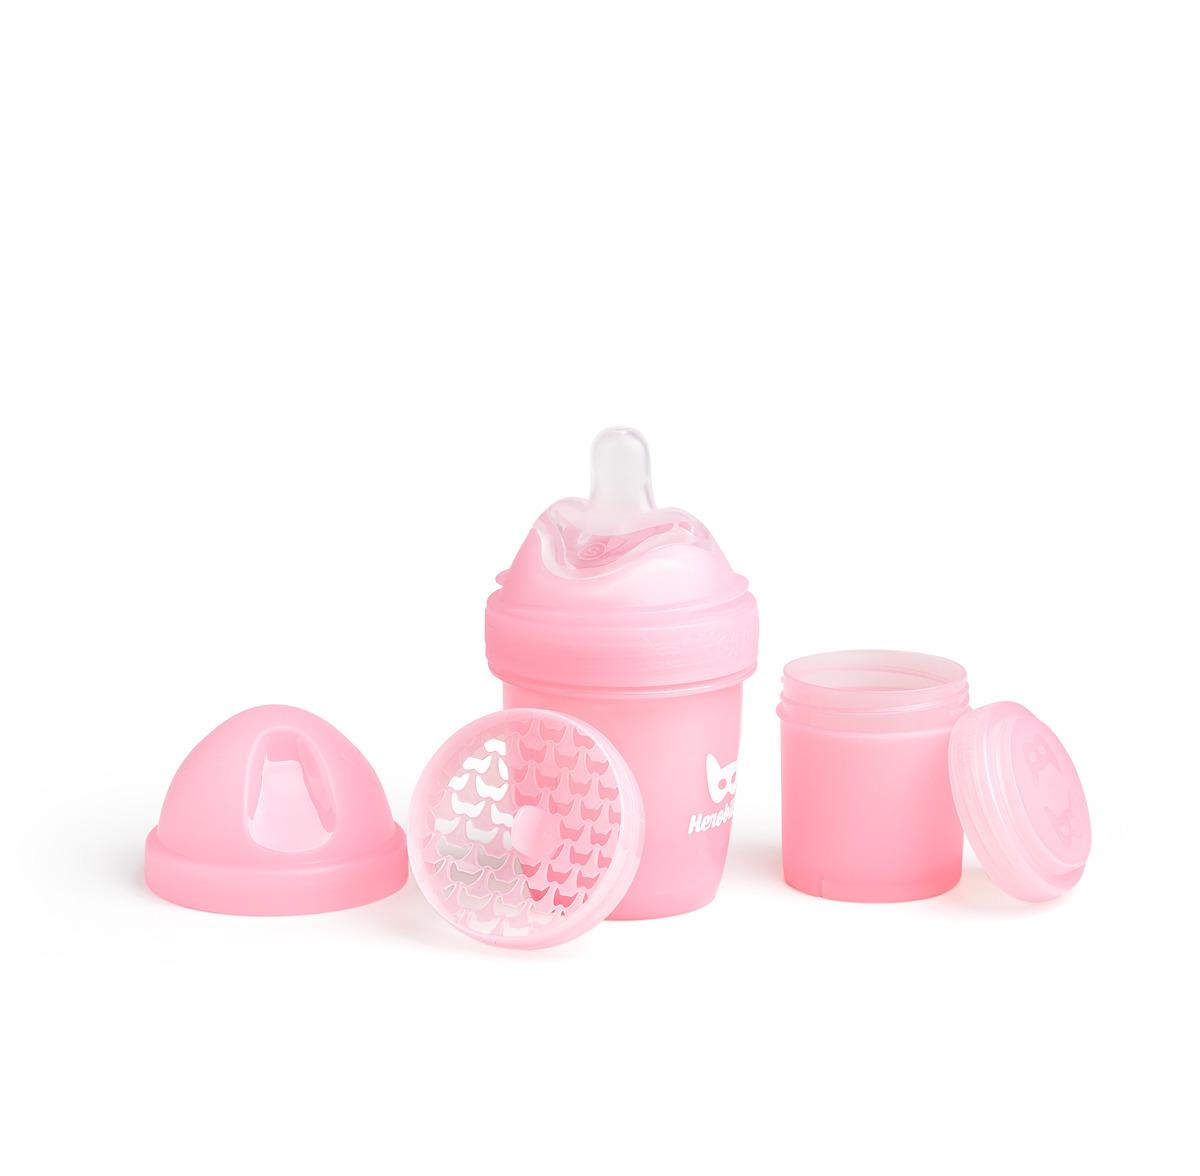 Herobility - butelka antykolkowa HeroBottle 140 ml, różowa + smoczek S (0 m+)